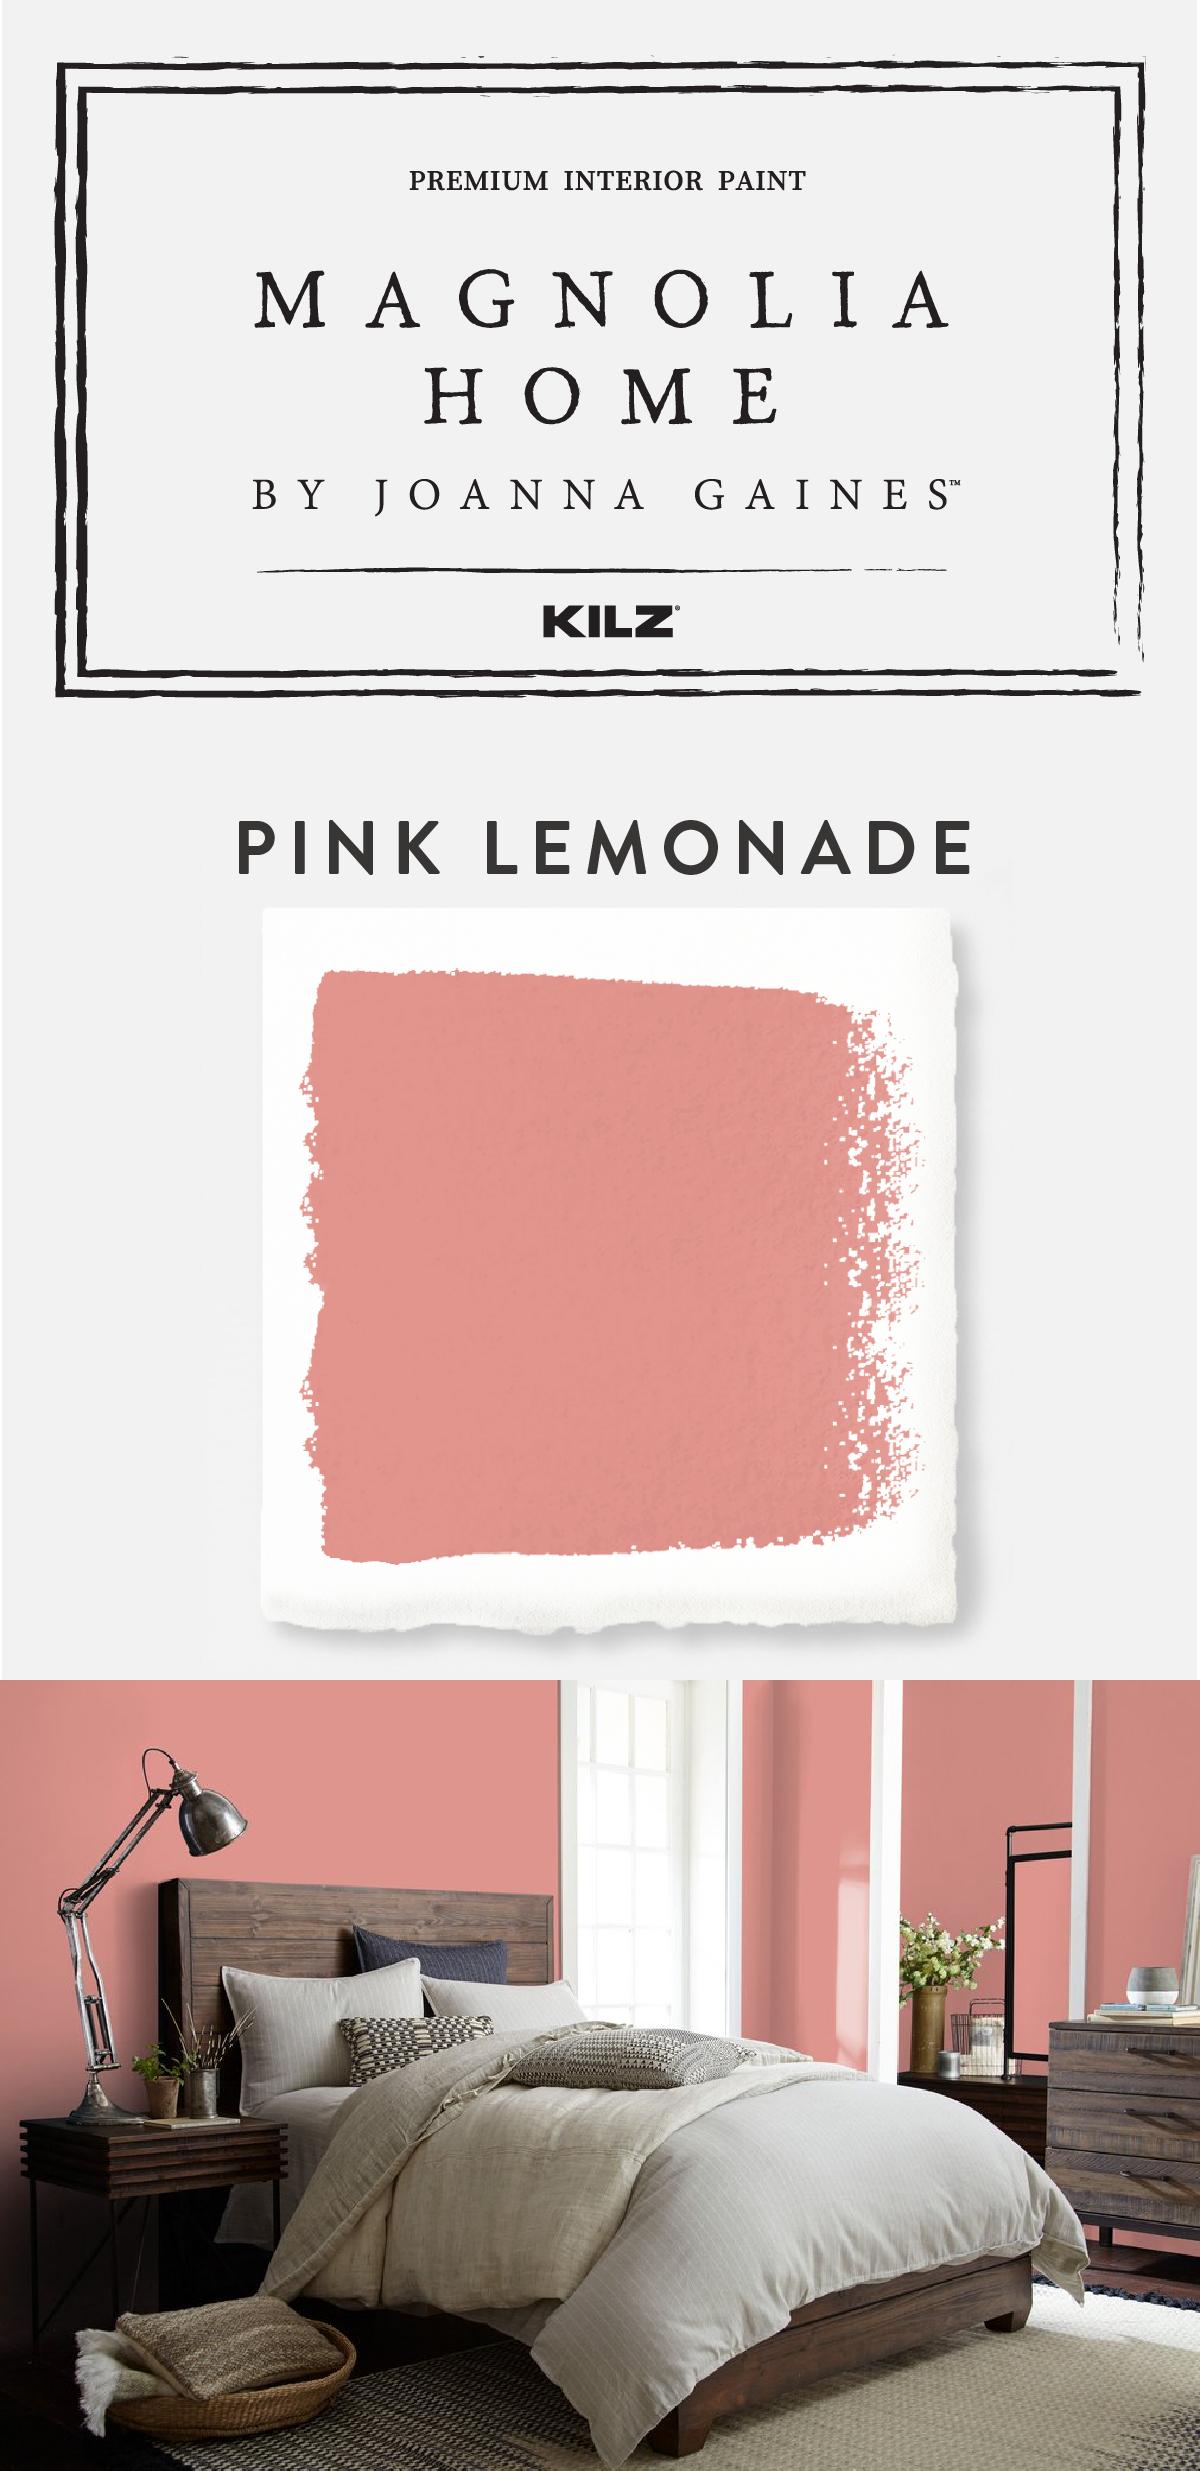 Pink Lemonade | Magnolia Home | Pinterest | Modern paint colors ...